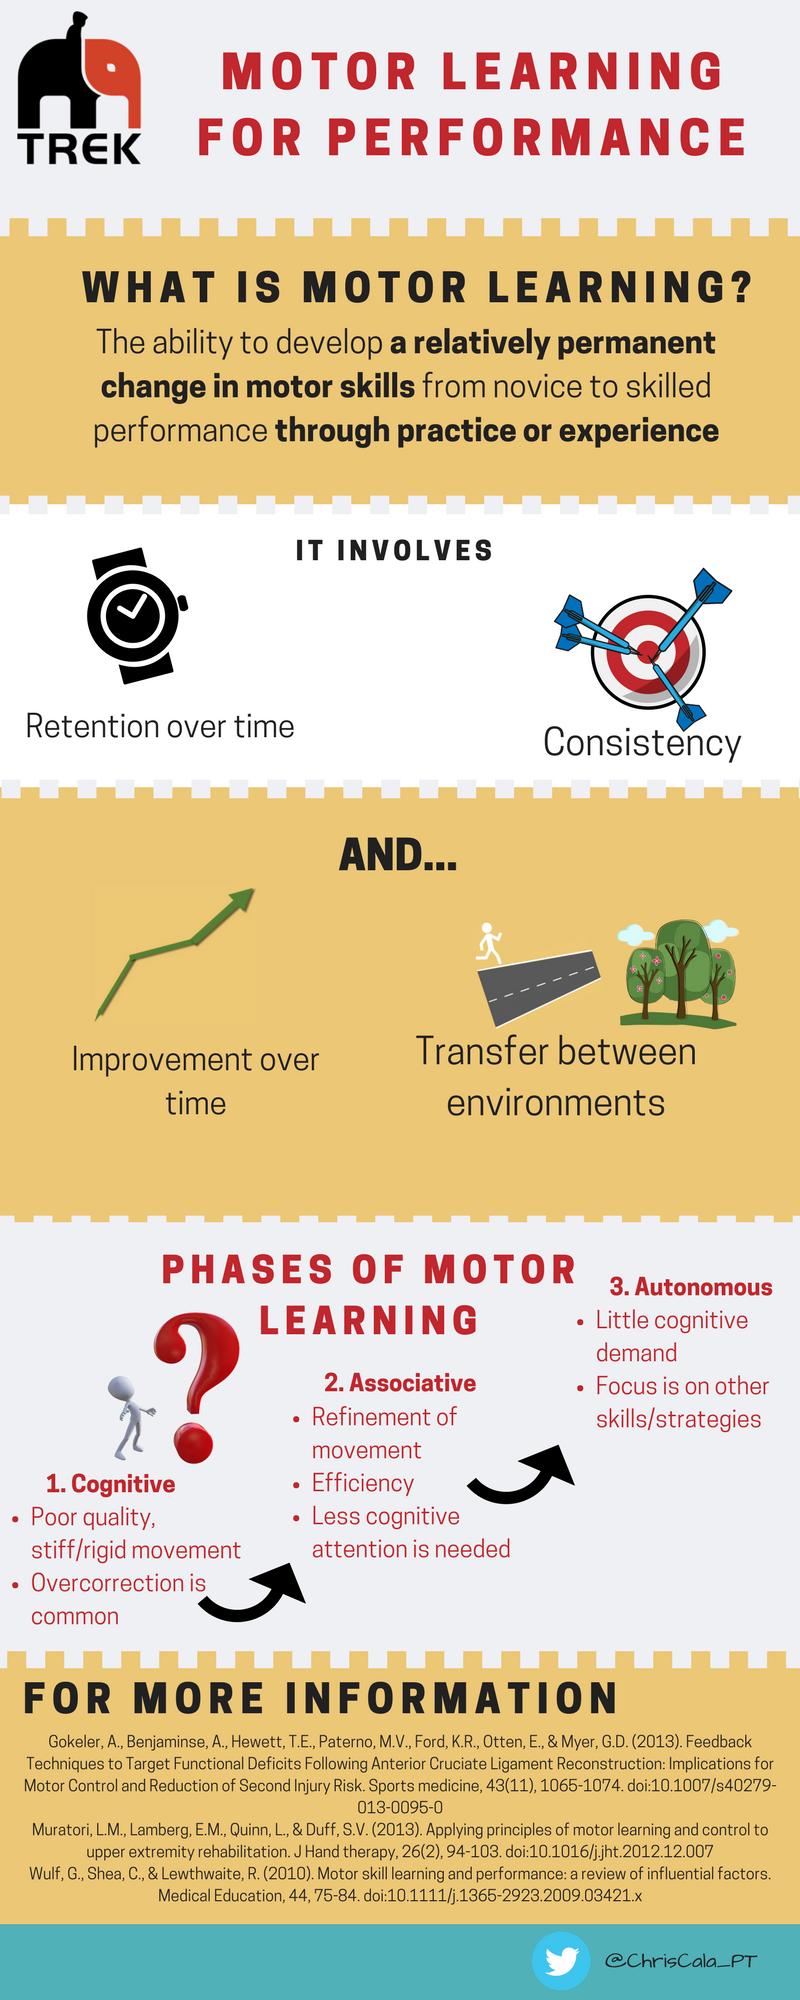 Motor learning for performance